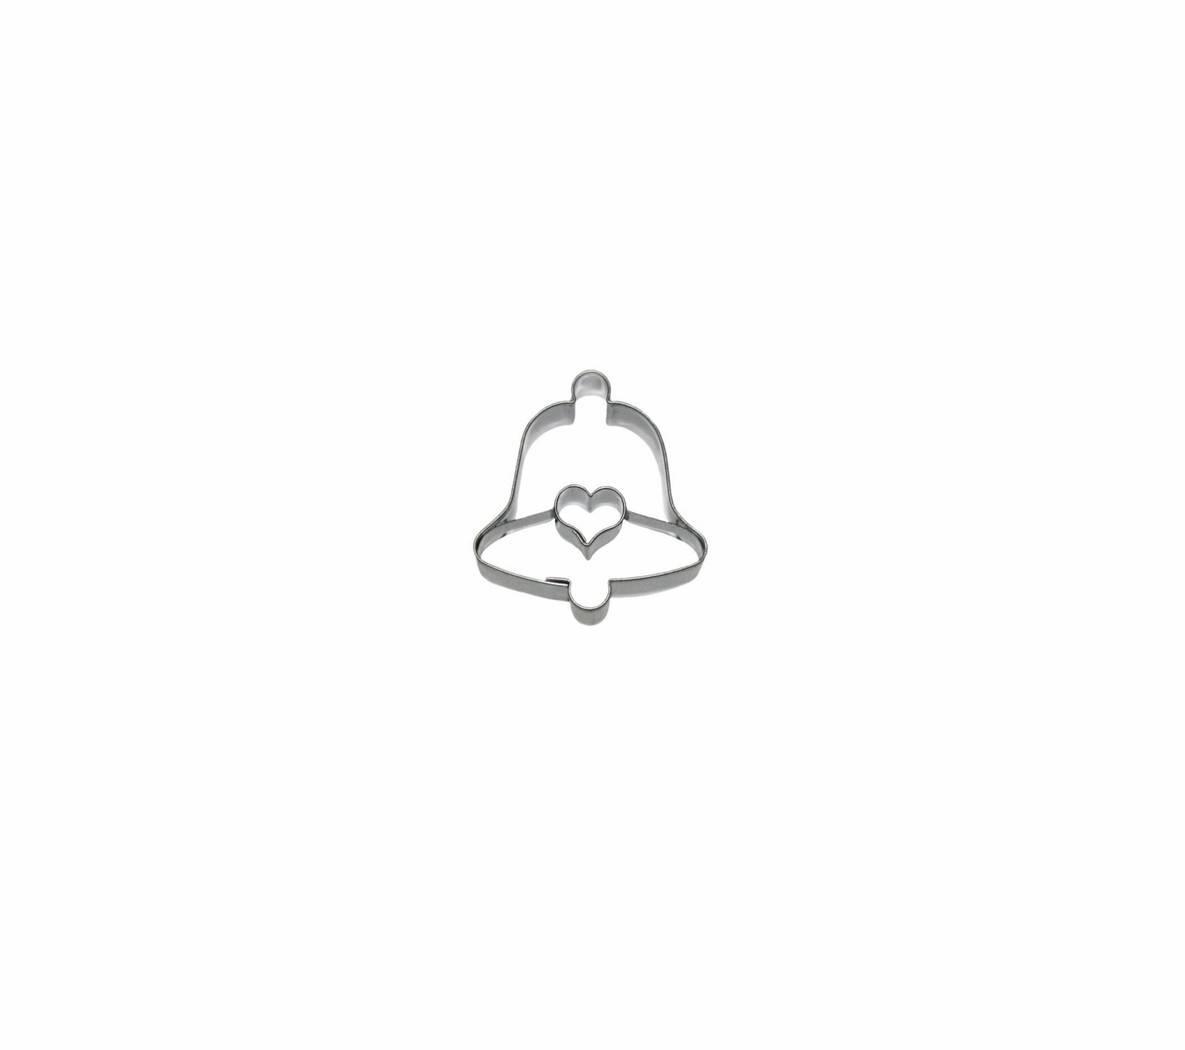 Vykrajovátko Zvonek III/srdíčko prohnuté - Smolík